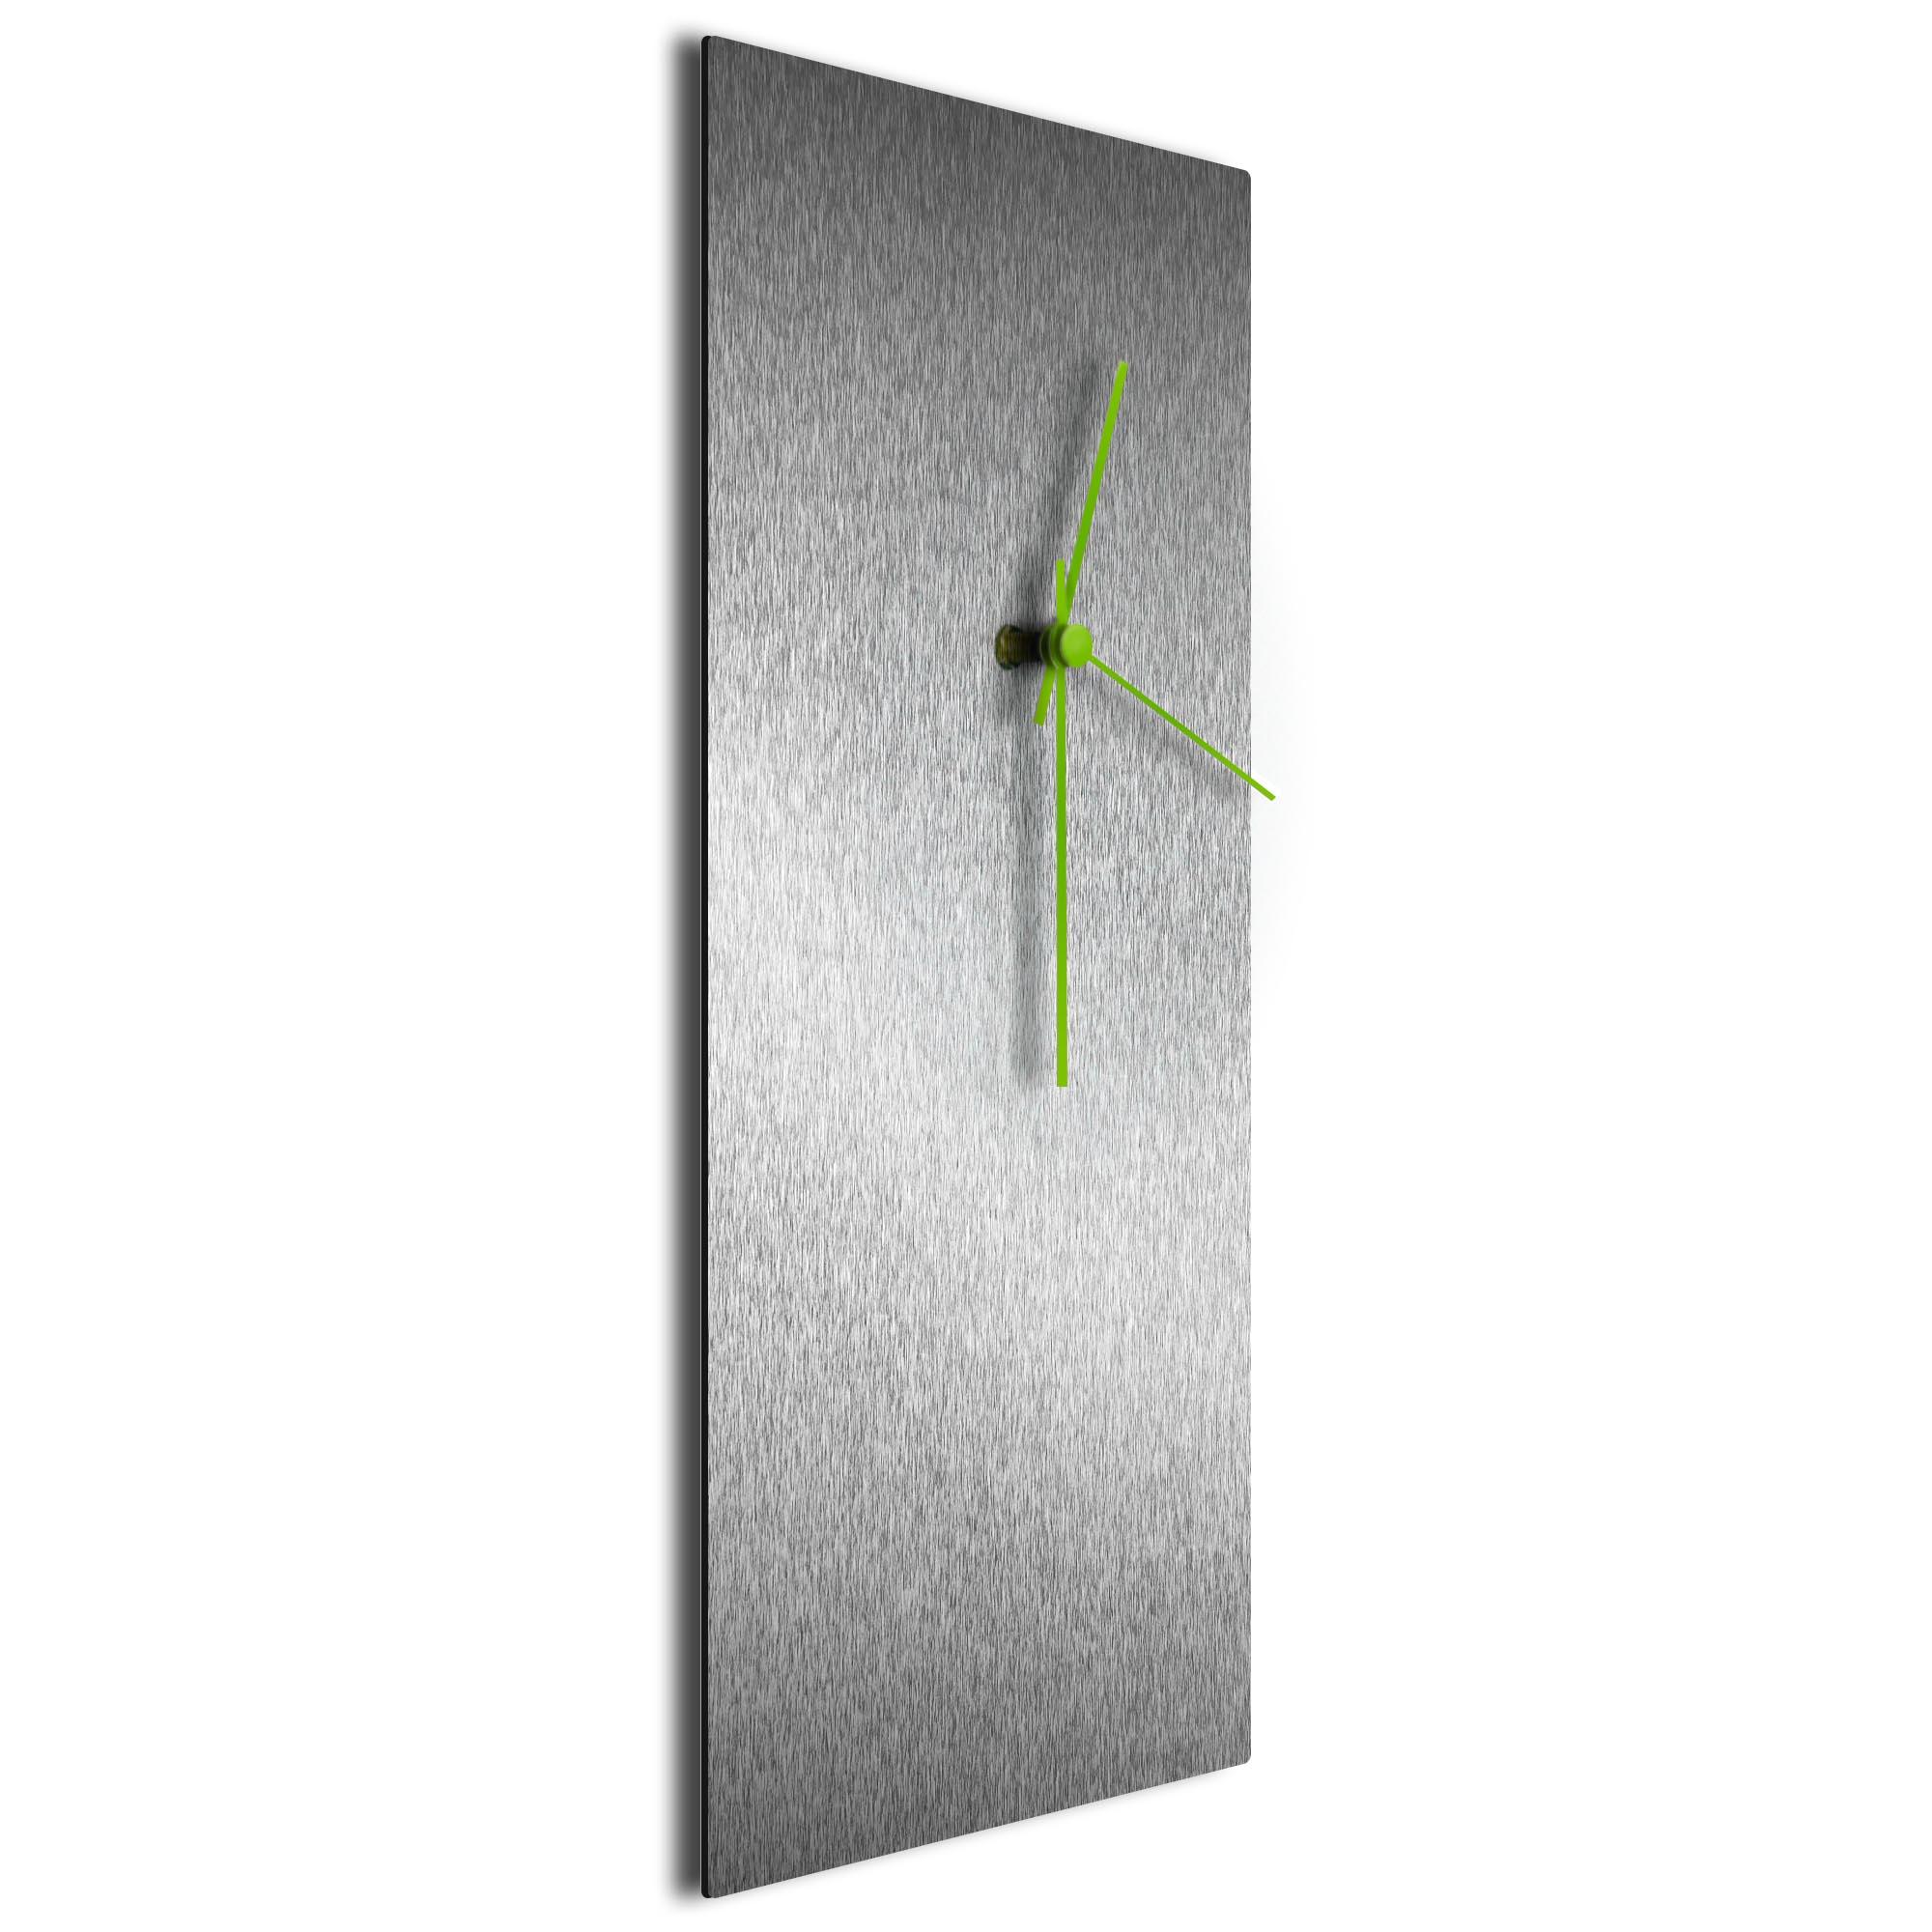 Silversmith Clock Large Green - Image 2